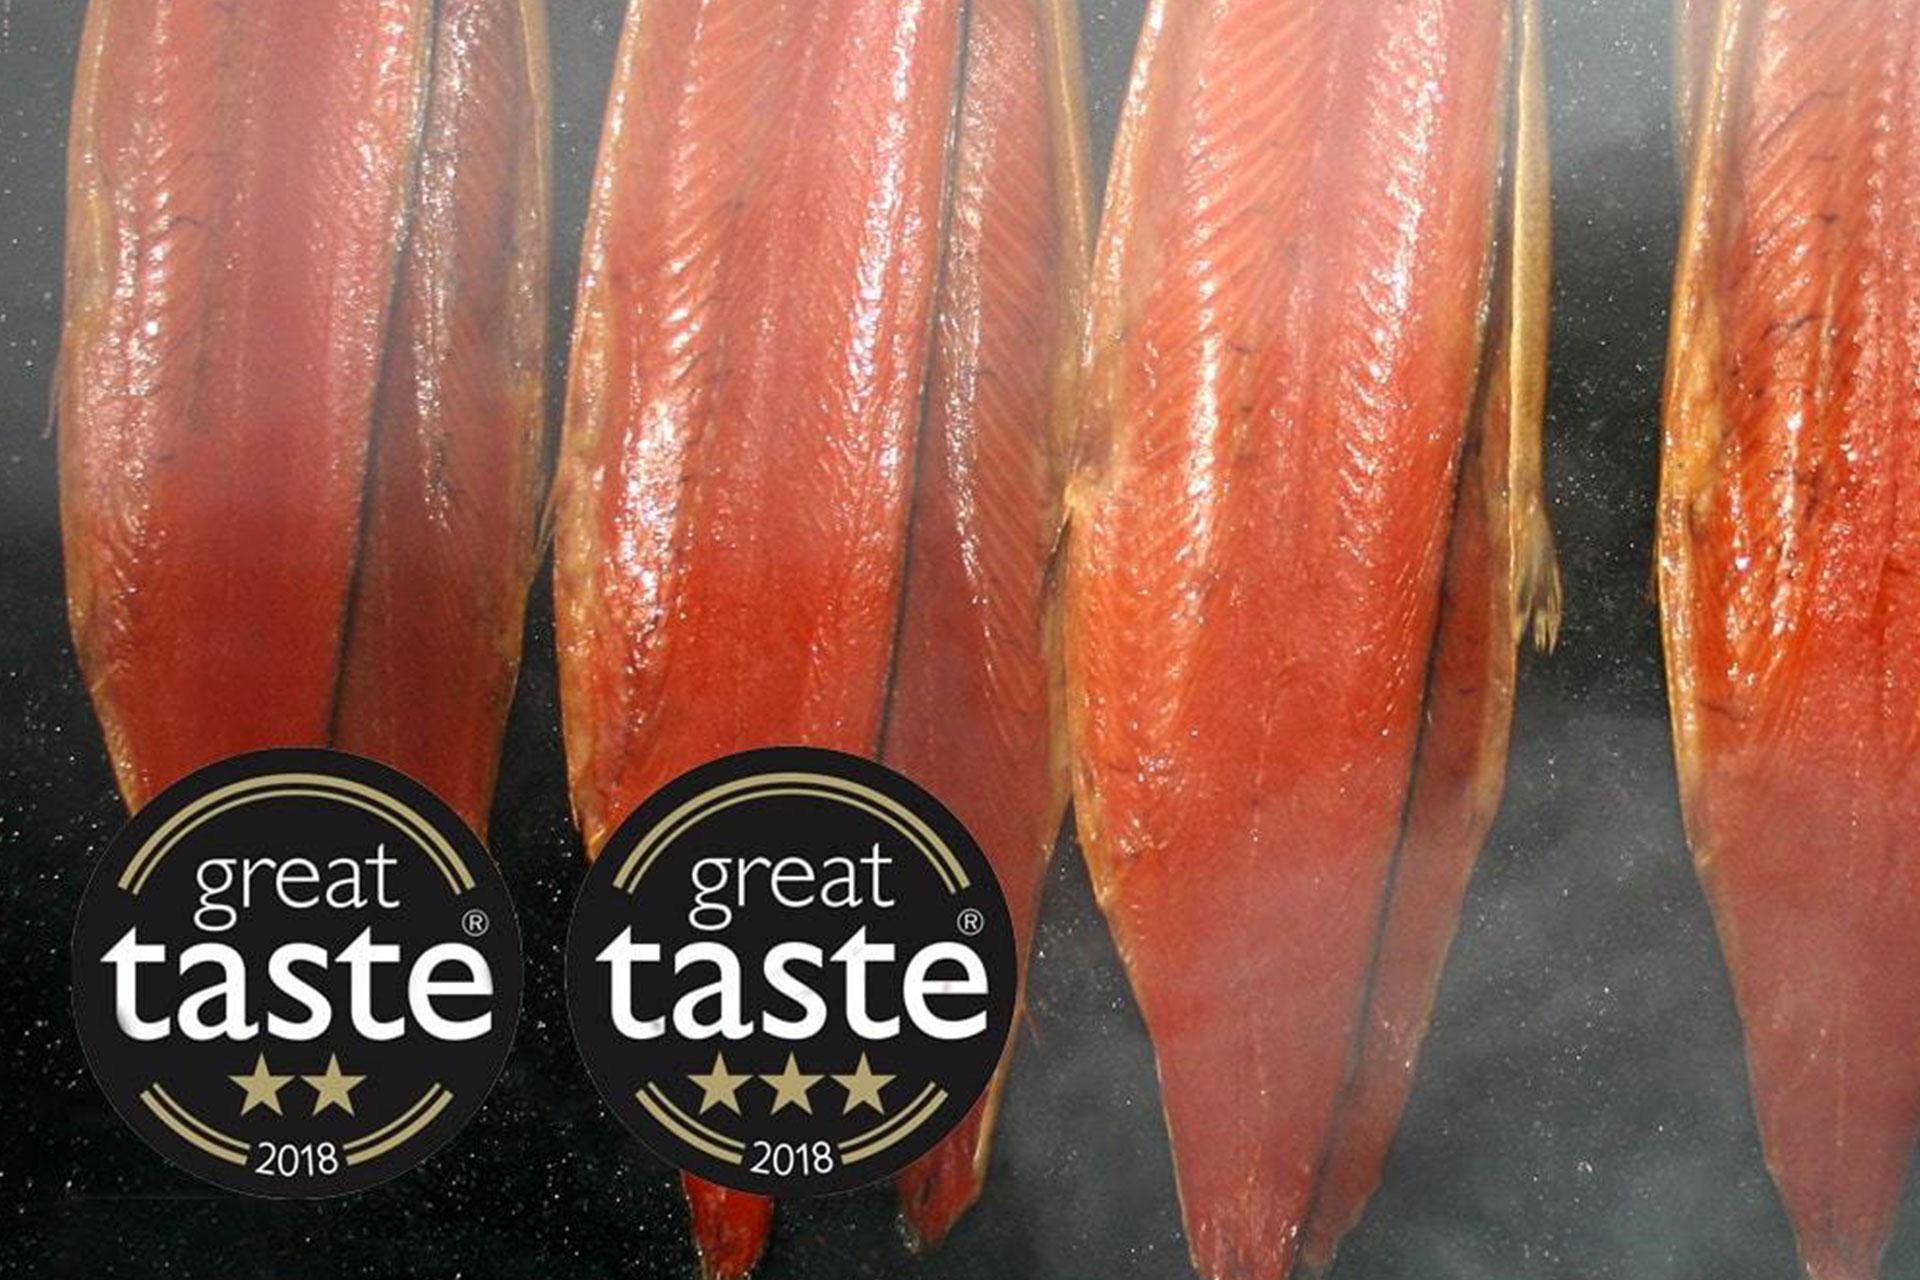 Grimsby smoked fish